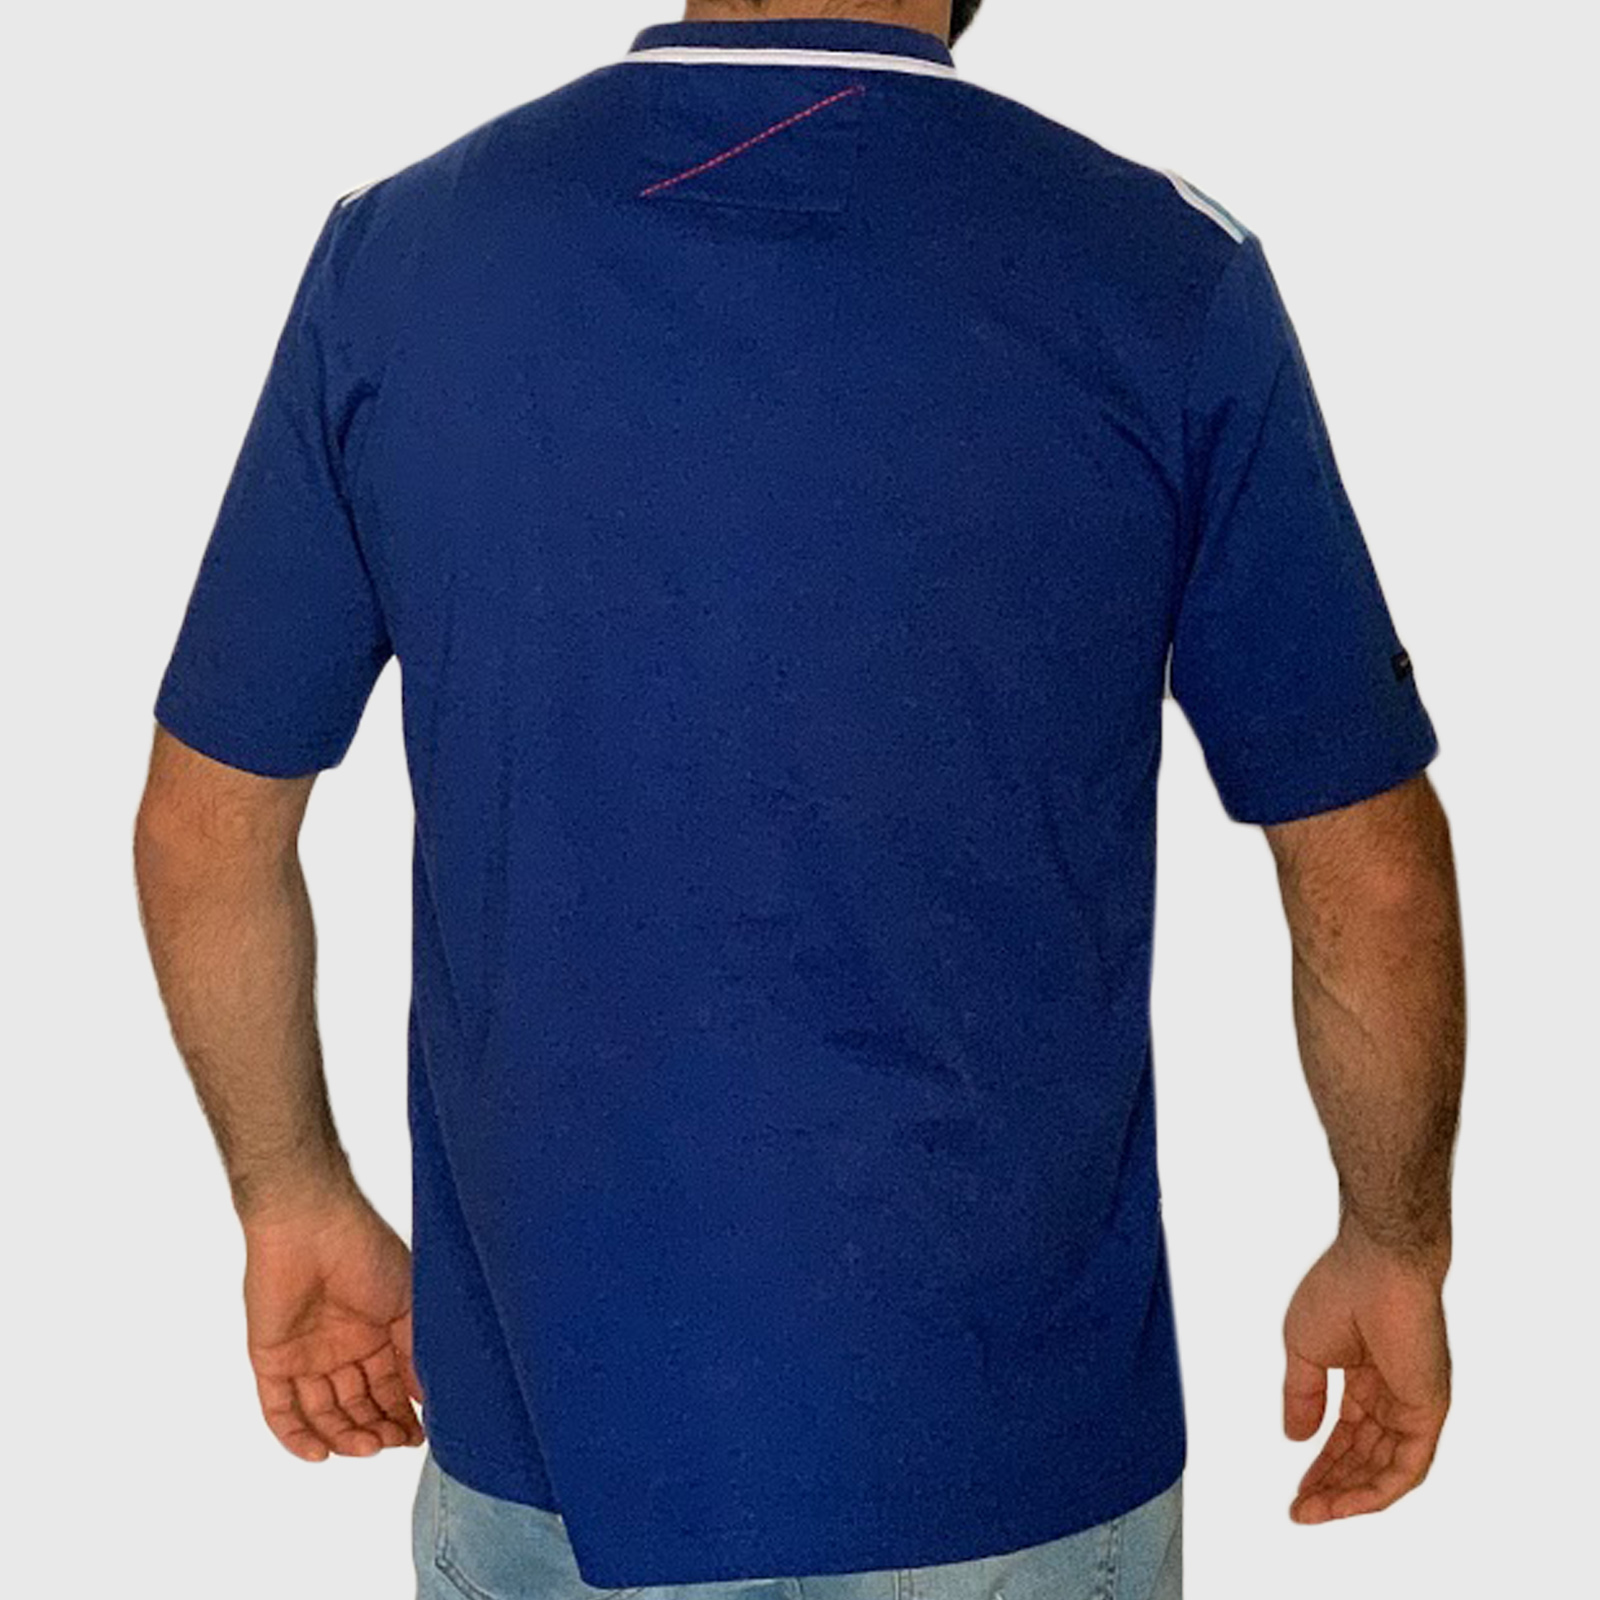 Мужская синяя футболка Sean John